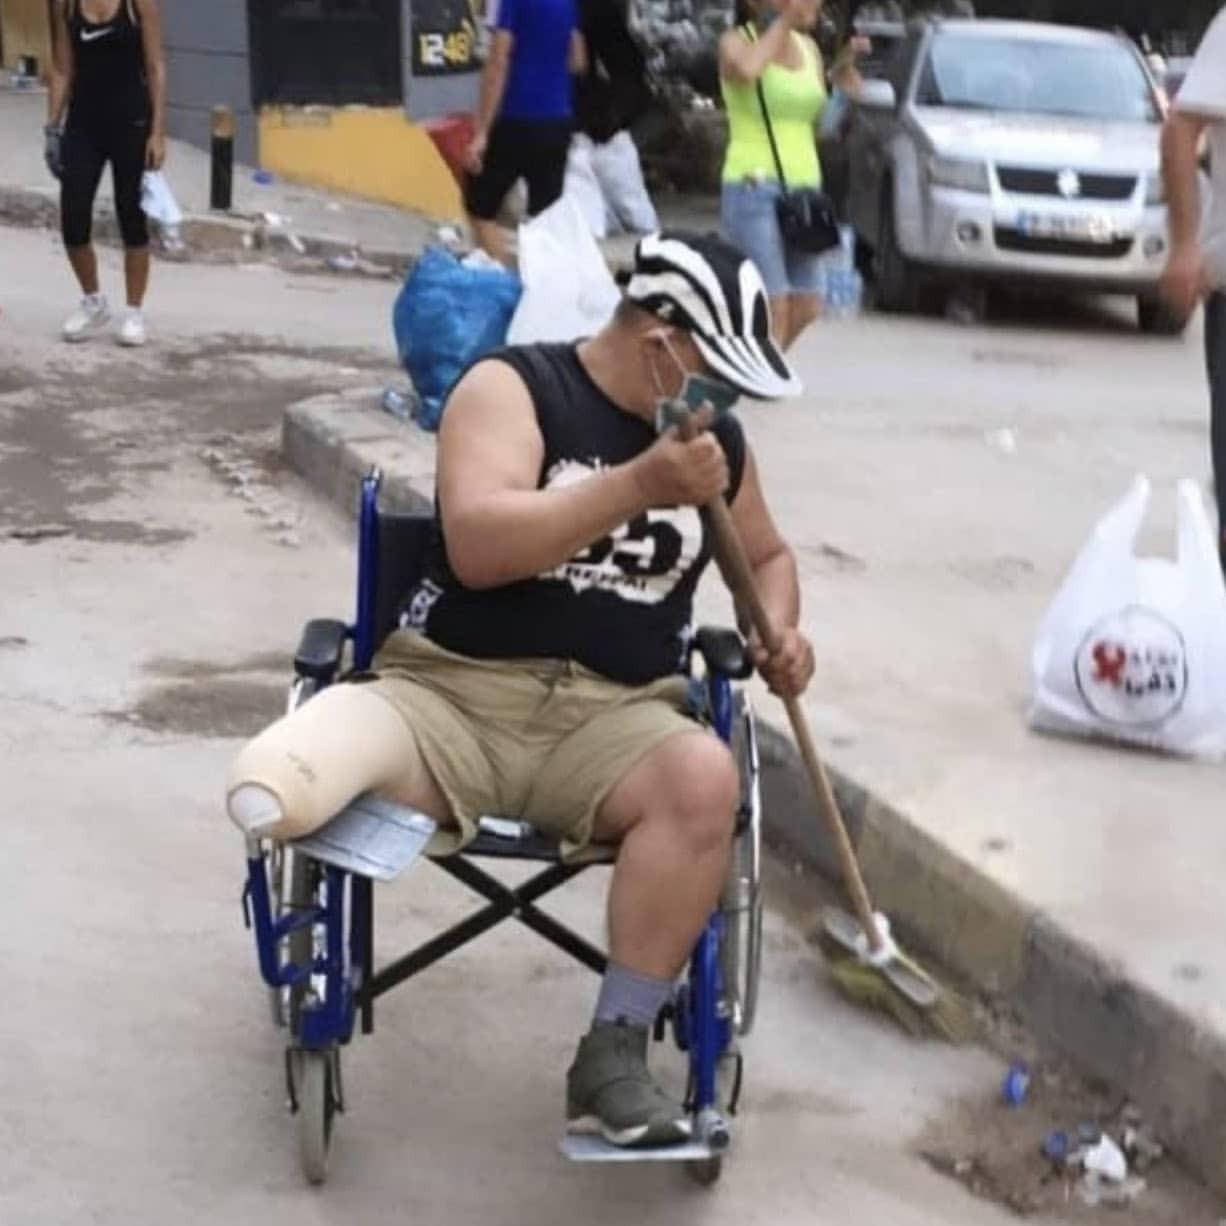 Beirut, donate, and broken image